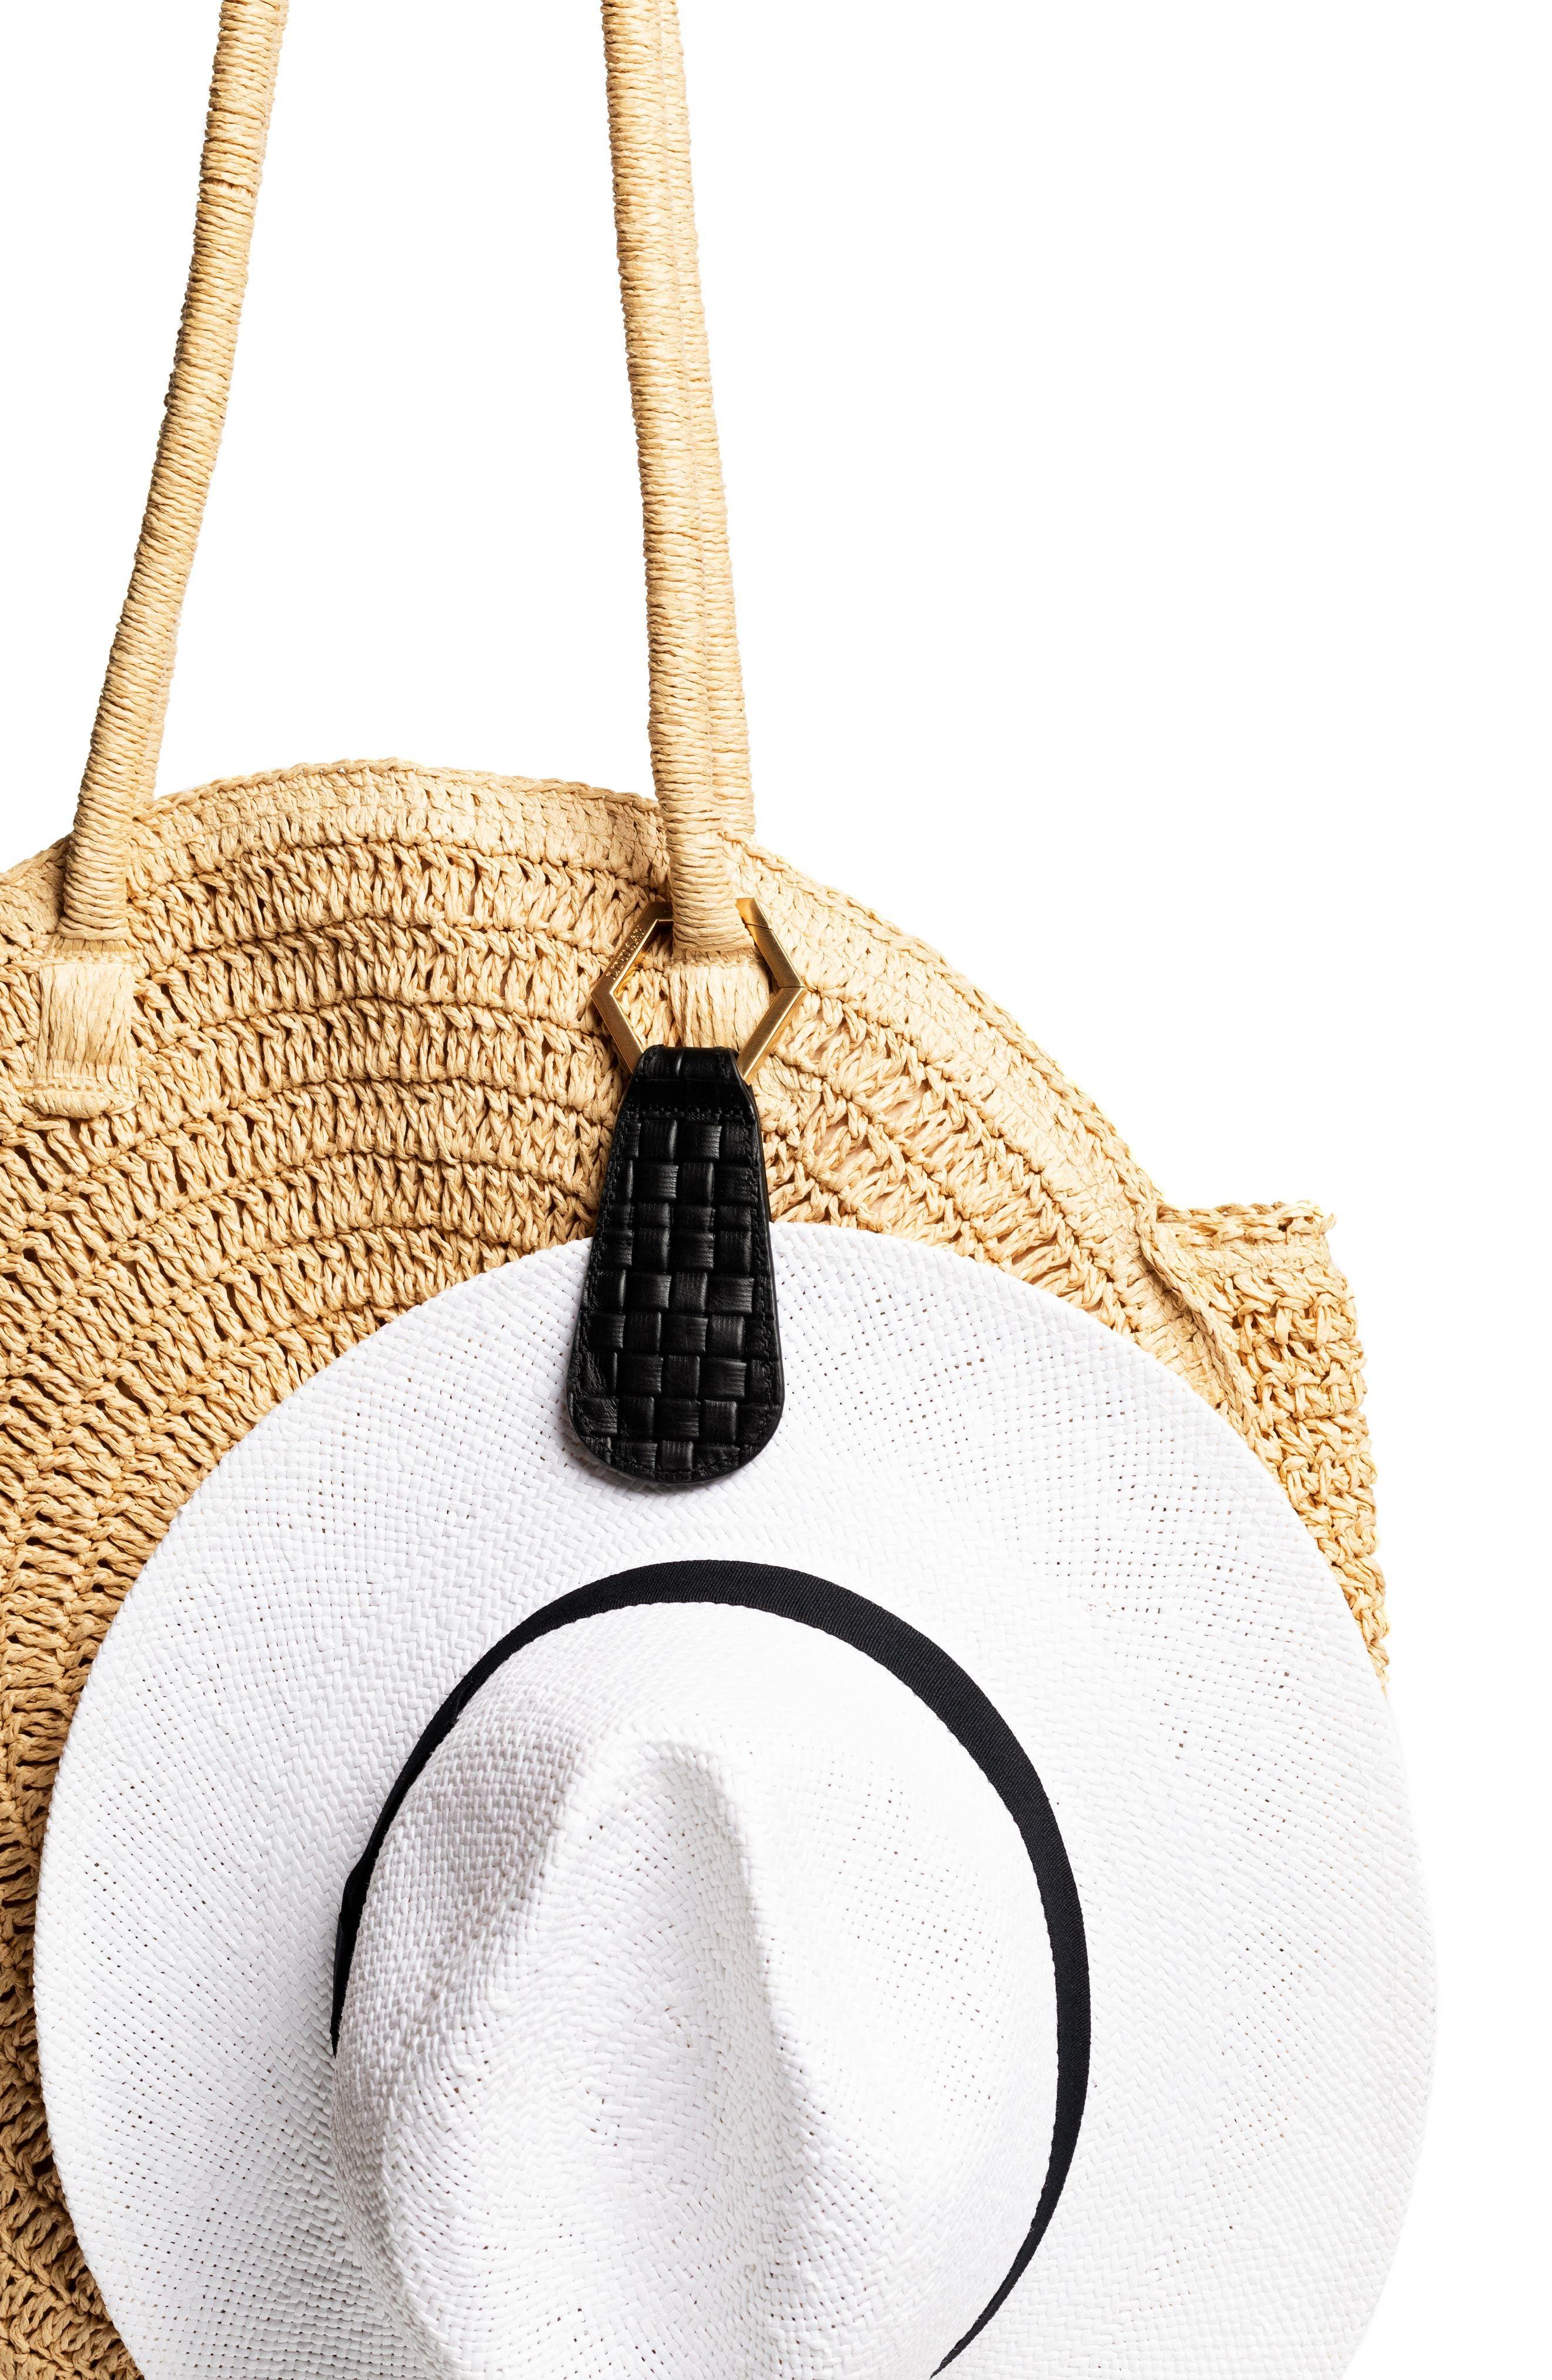 Toptote The Drop Leather Hat Holder Nordstrom In 2021 Leather Hats Modern Handbag Hat Holder